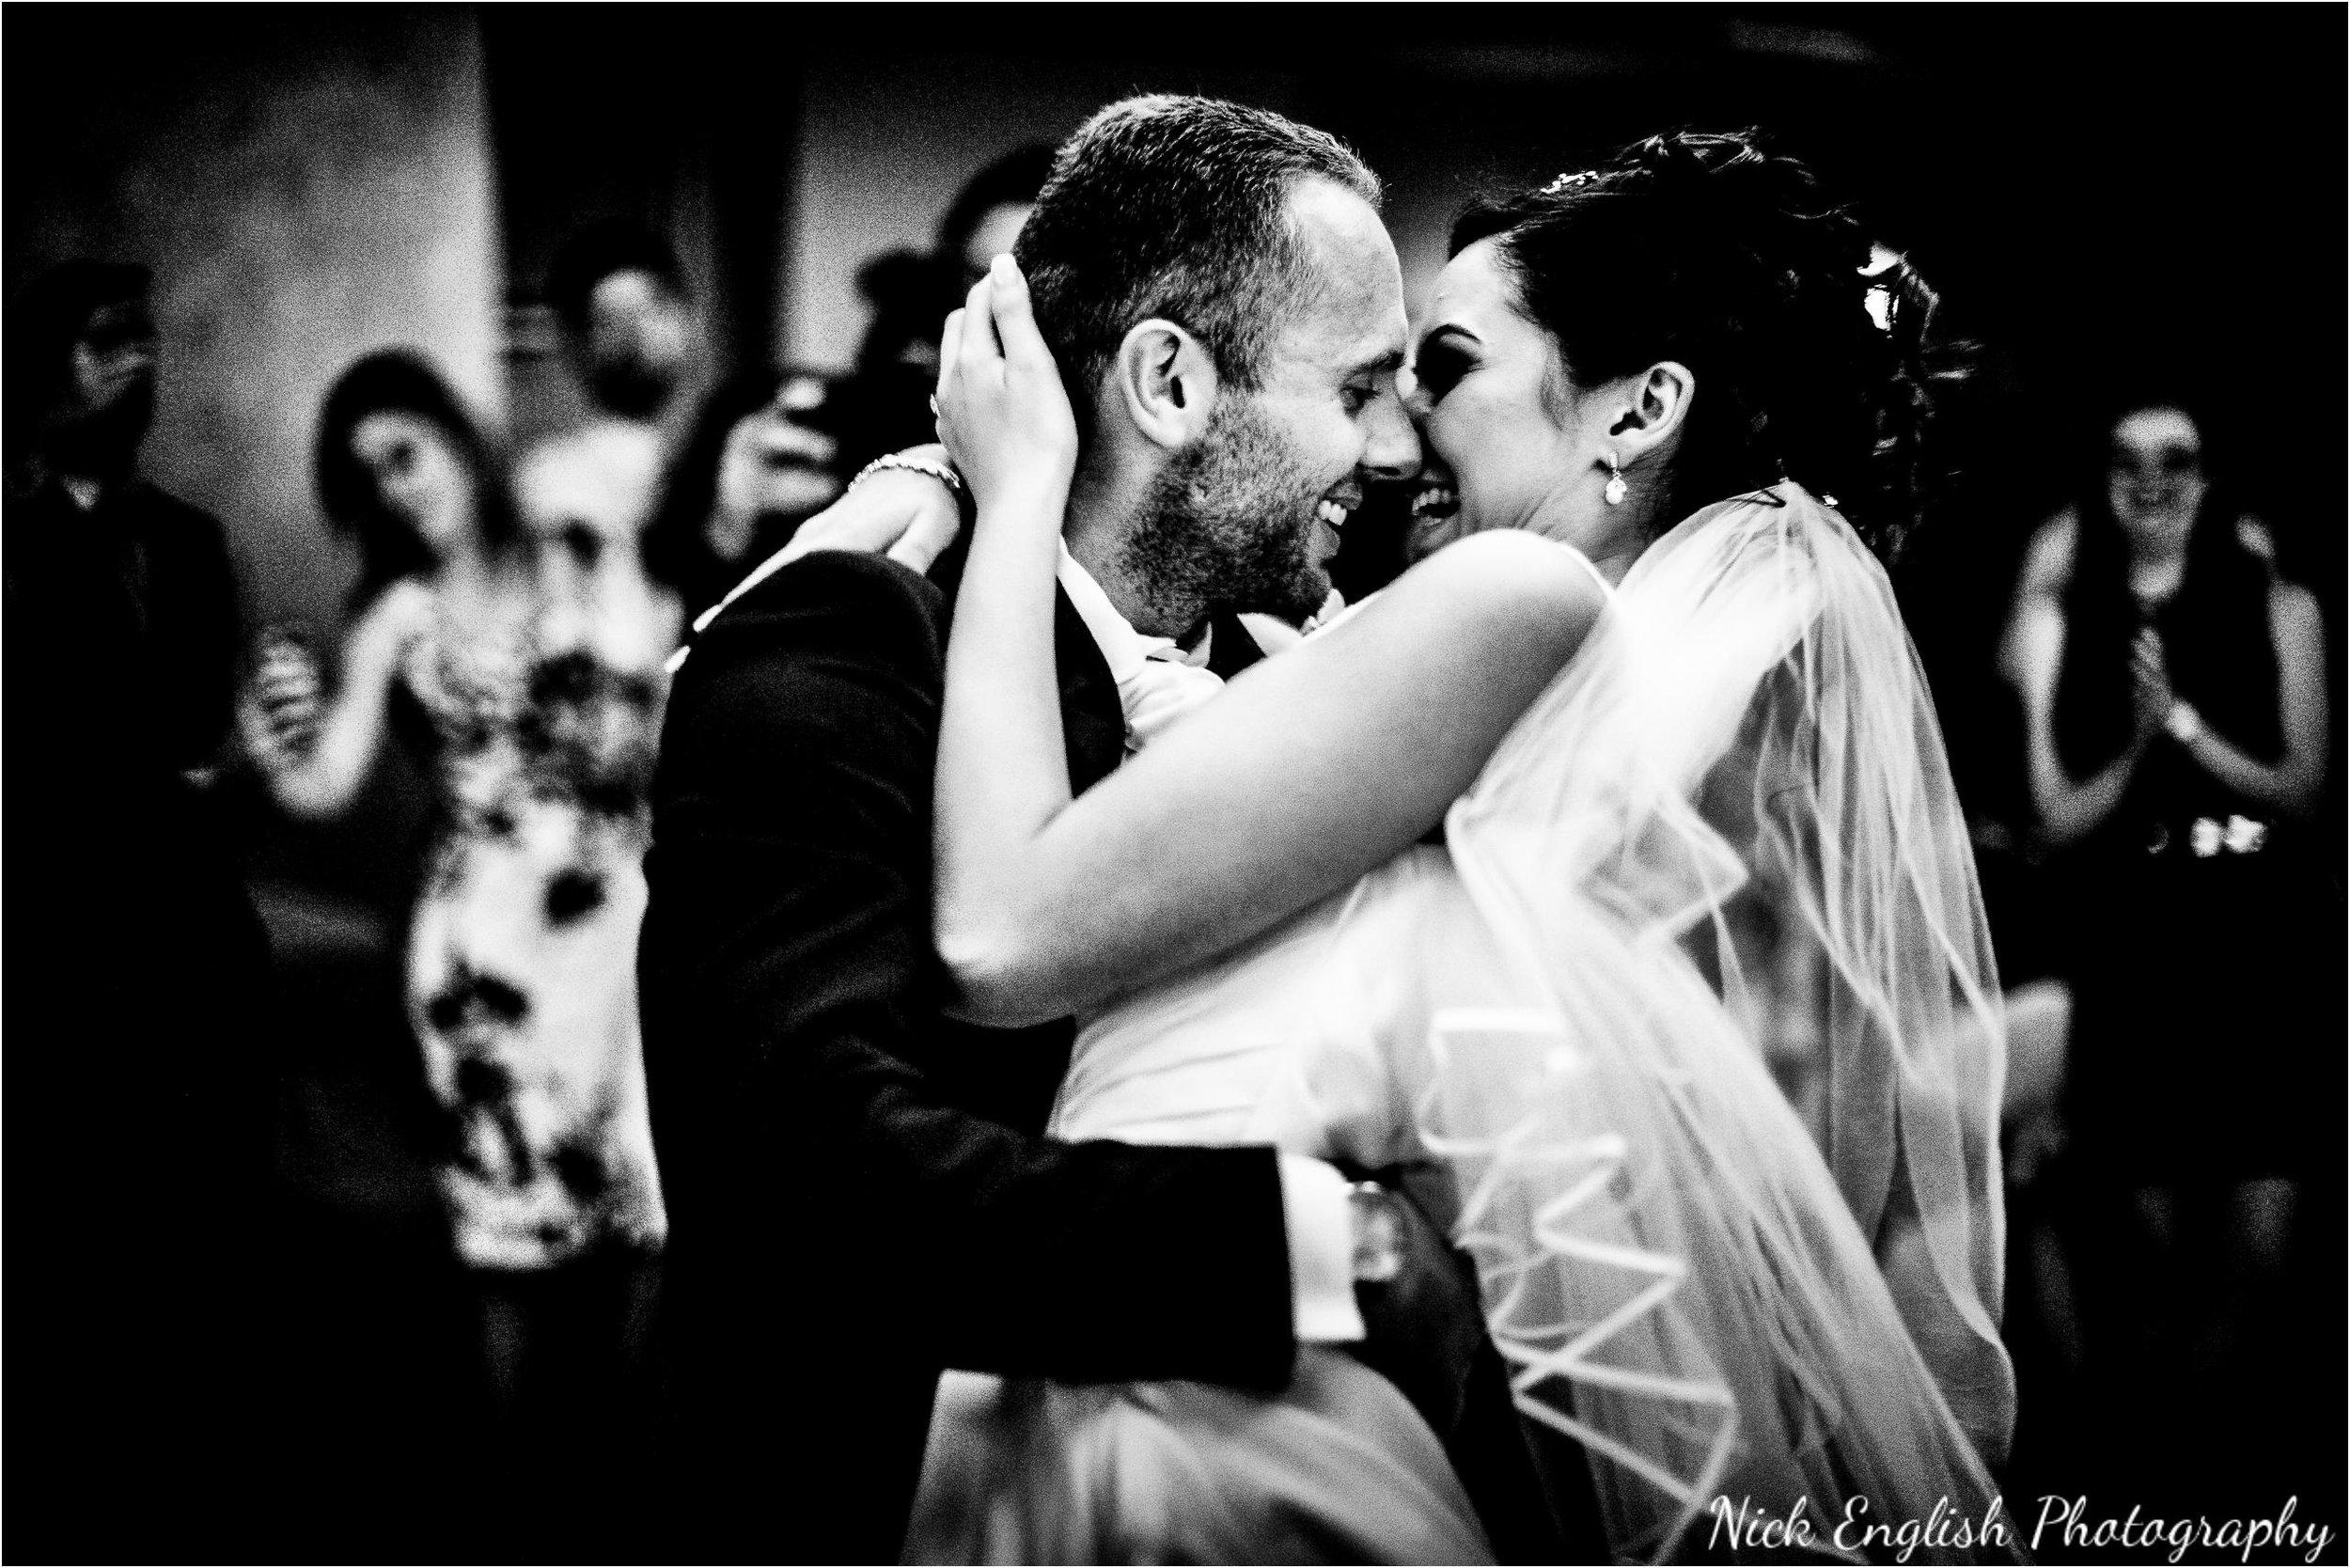 Emily David Wedding Photographs at Barton Grange Preston by Nick English Photography 226jpg.jpeg